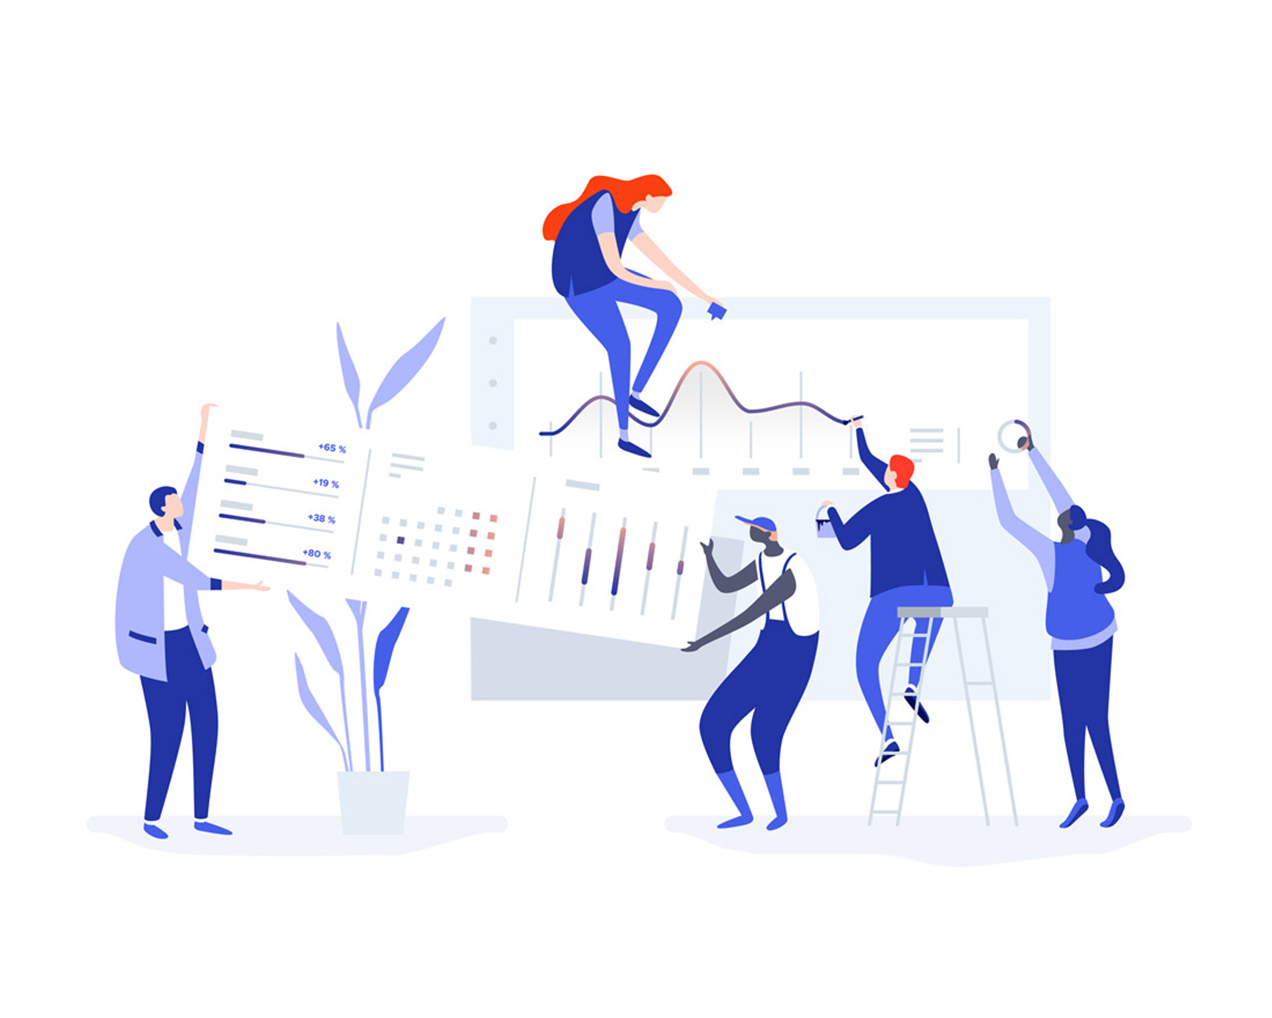 design-services-hero-image.jpg